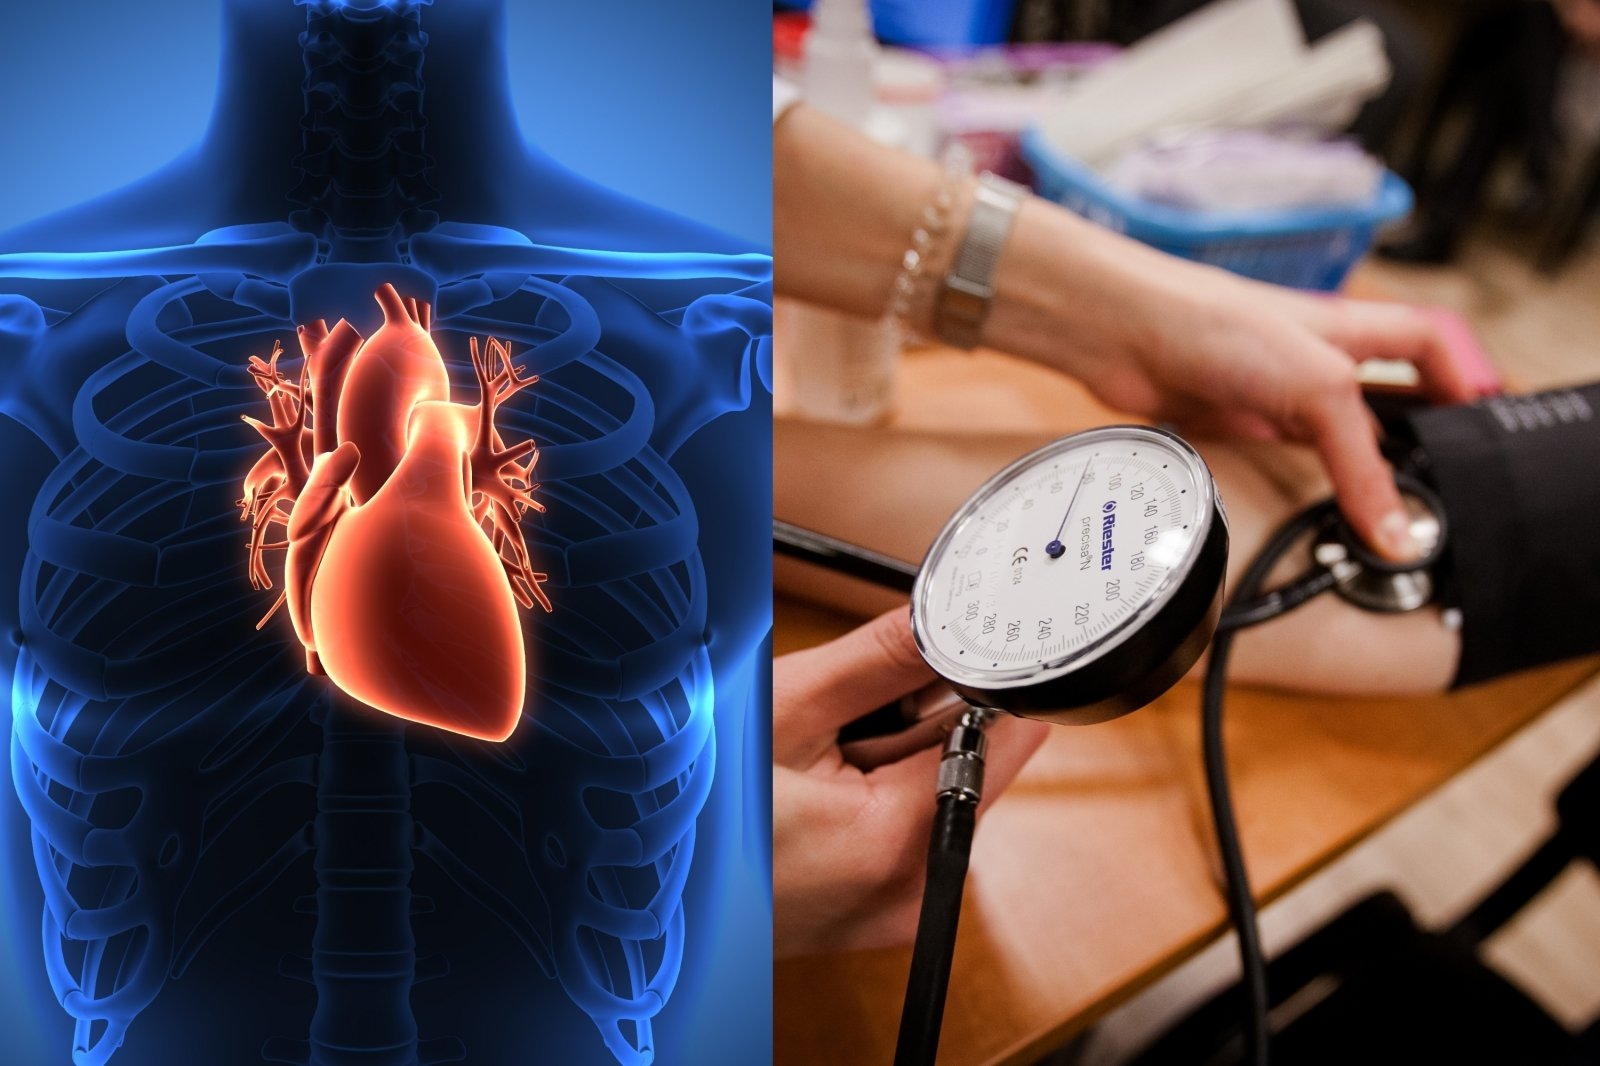 kraujospūdis širdies sveikata